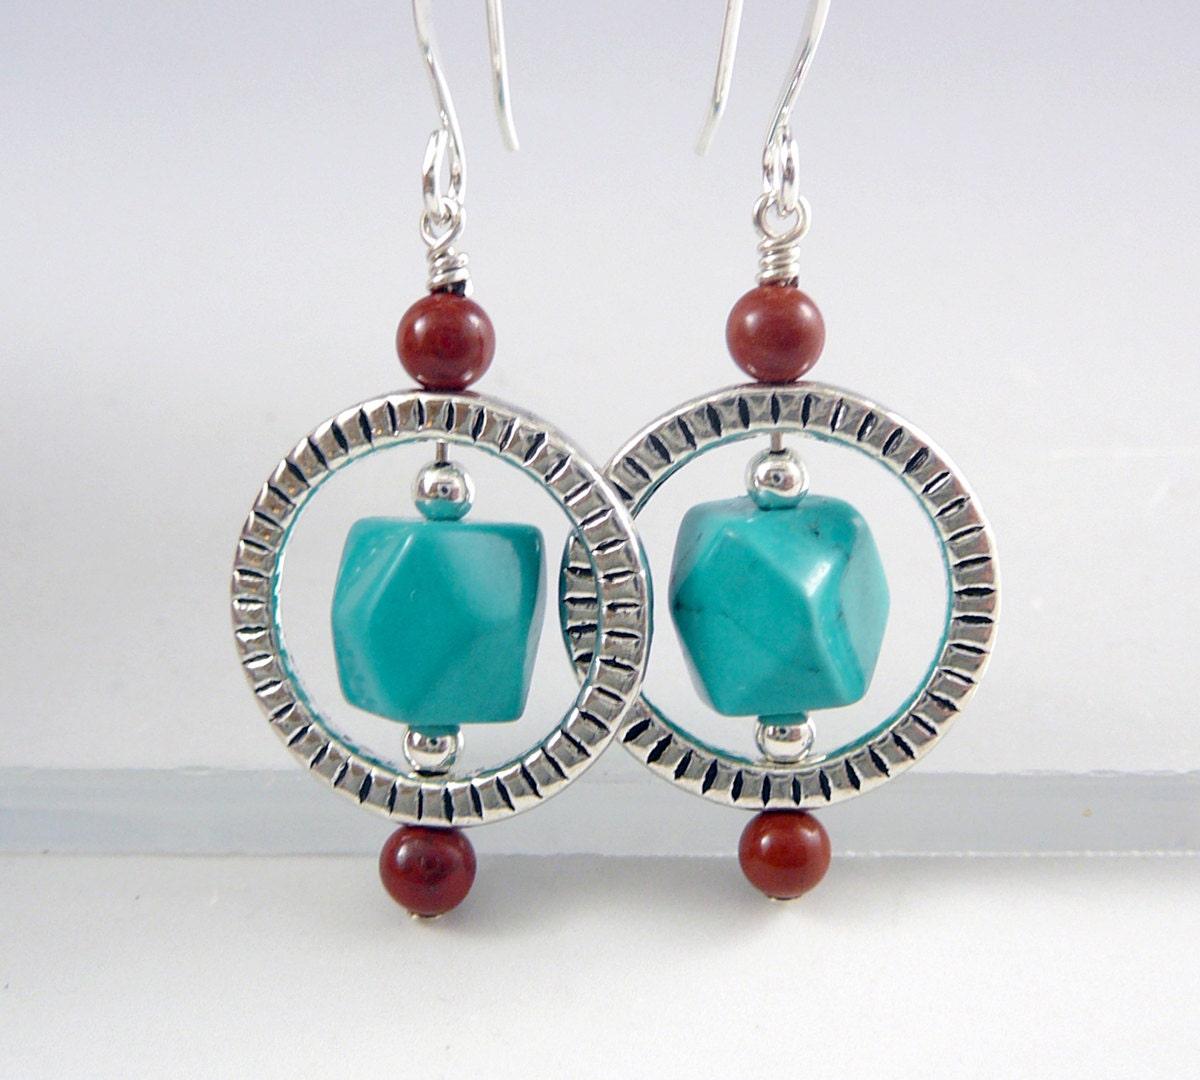 turquoise drop earrings december birthstone jewelry western. Black Bedroom Furniture Sets. Home Design Ideas